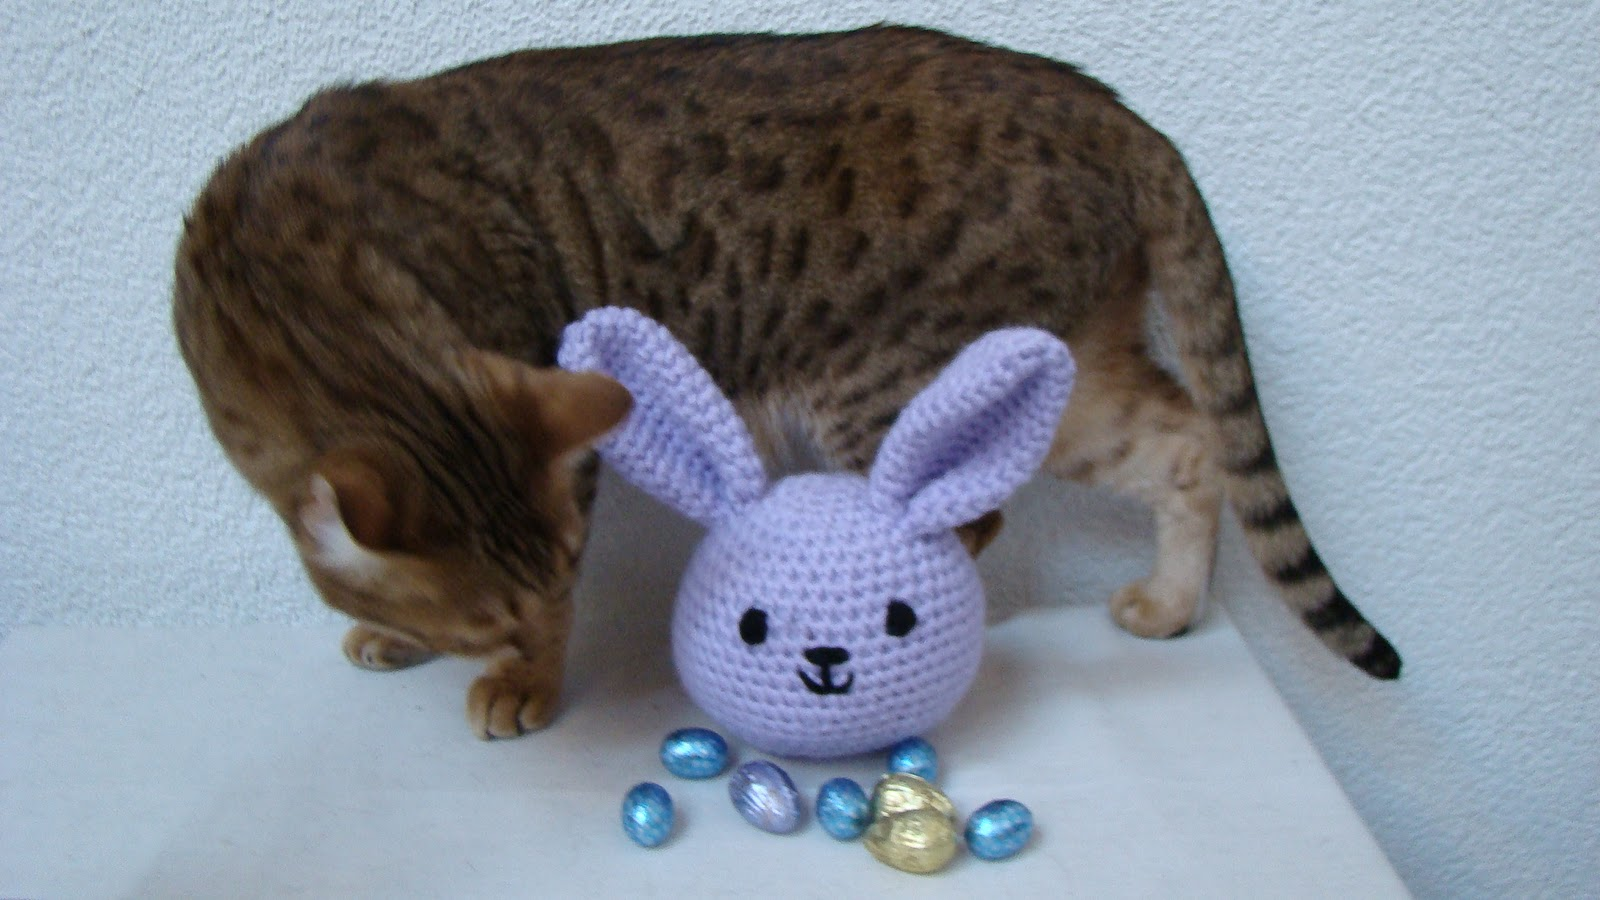 Amigurumi Cute Rabbit : Roving Around Crafts: Sweet Lilac Amigurumi Rabbit: in an ...